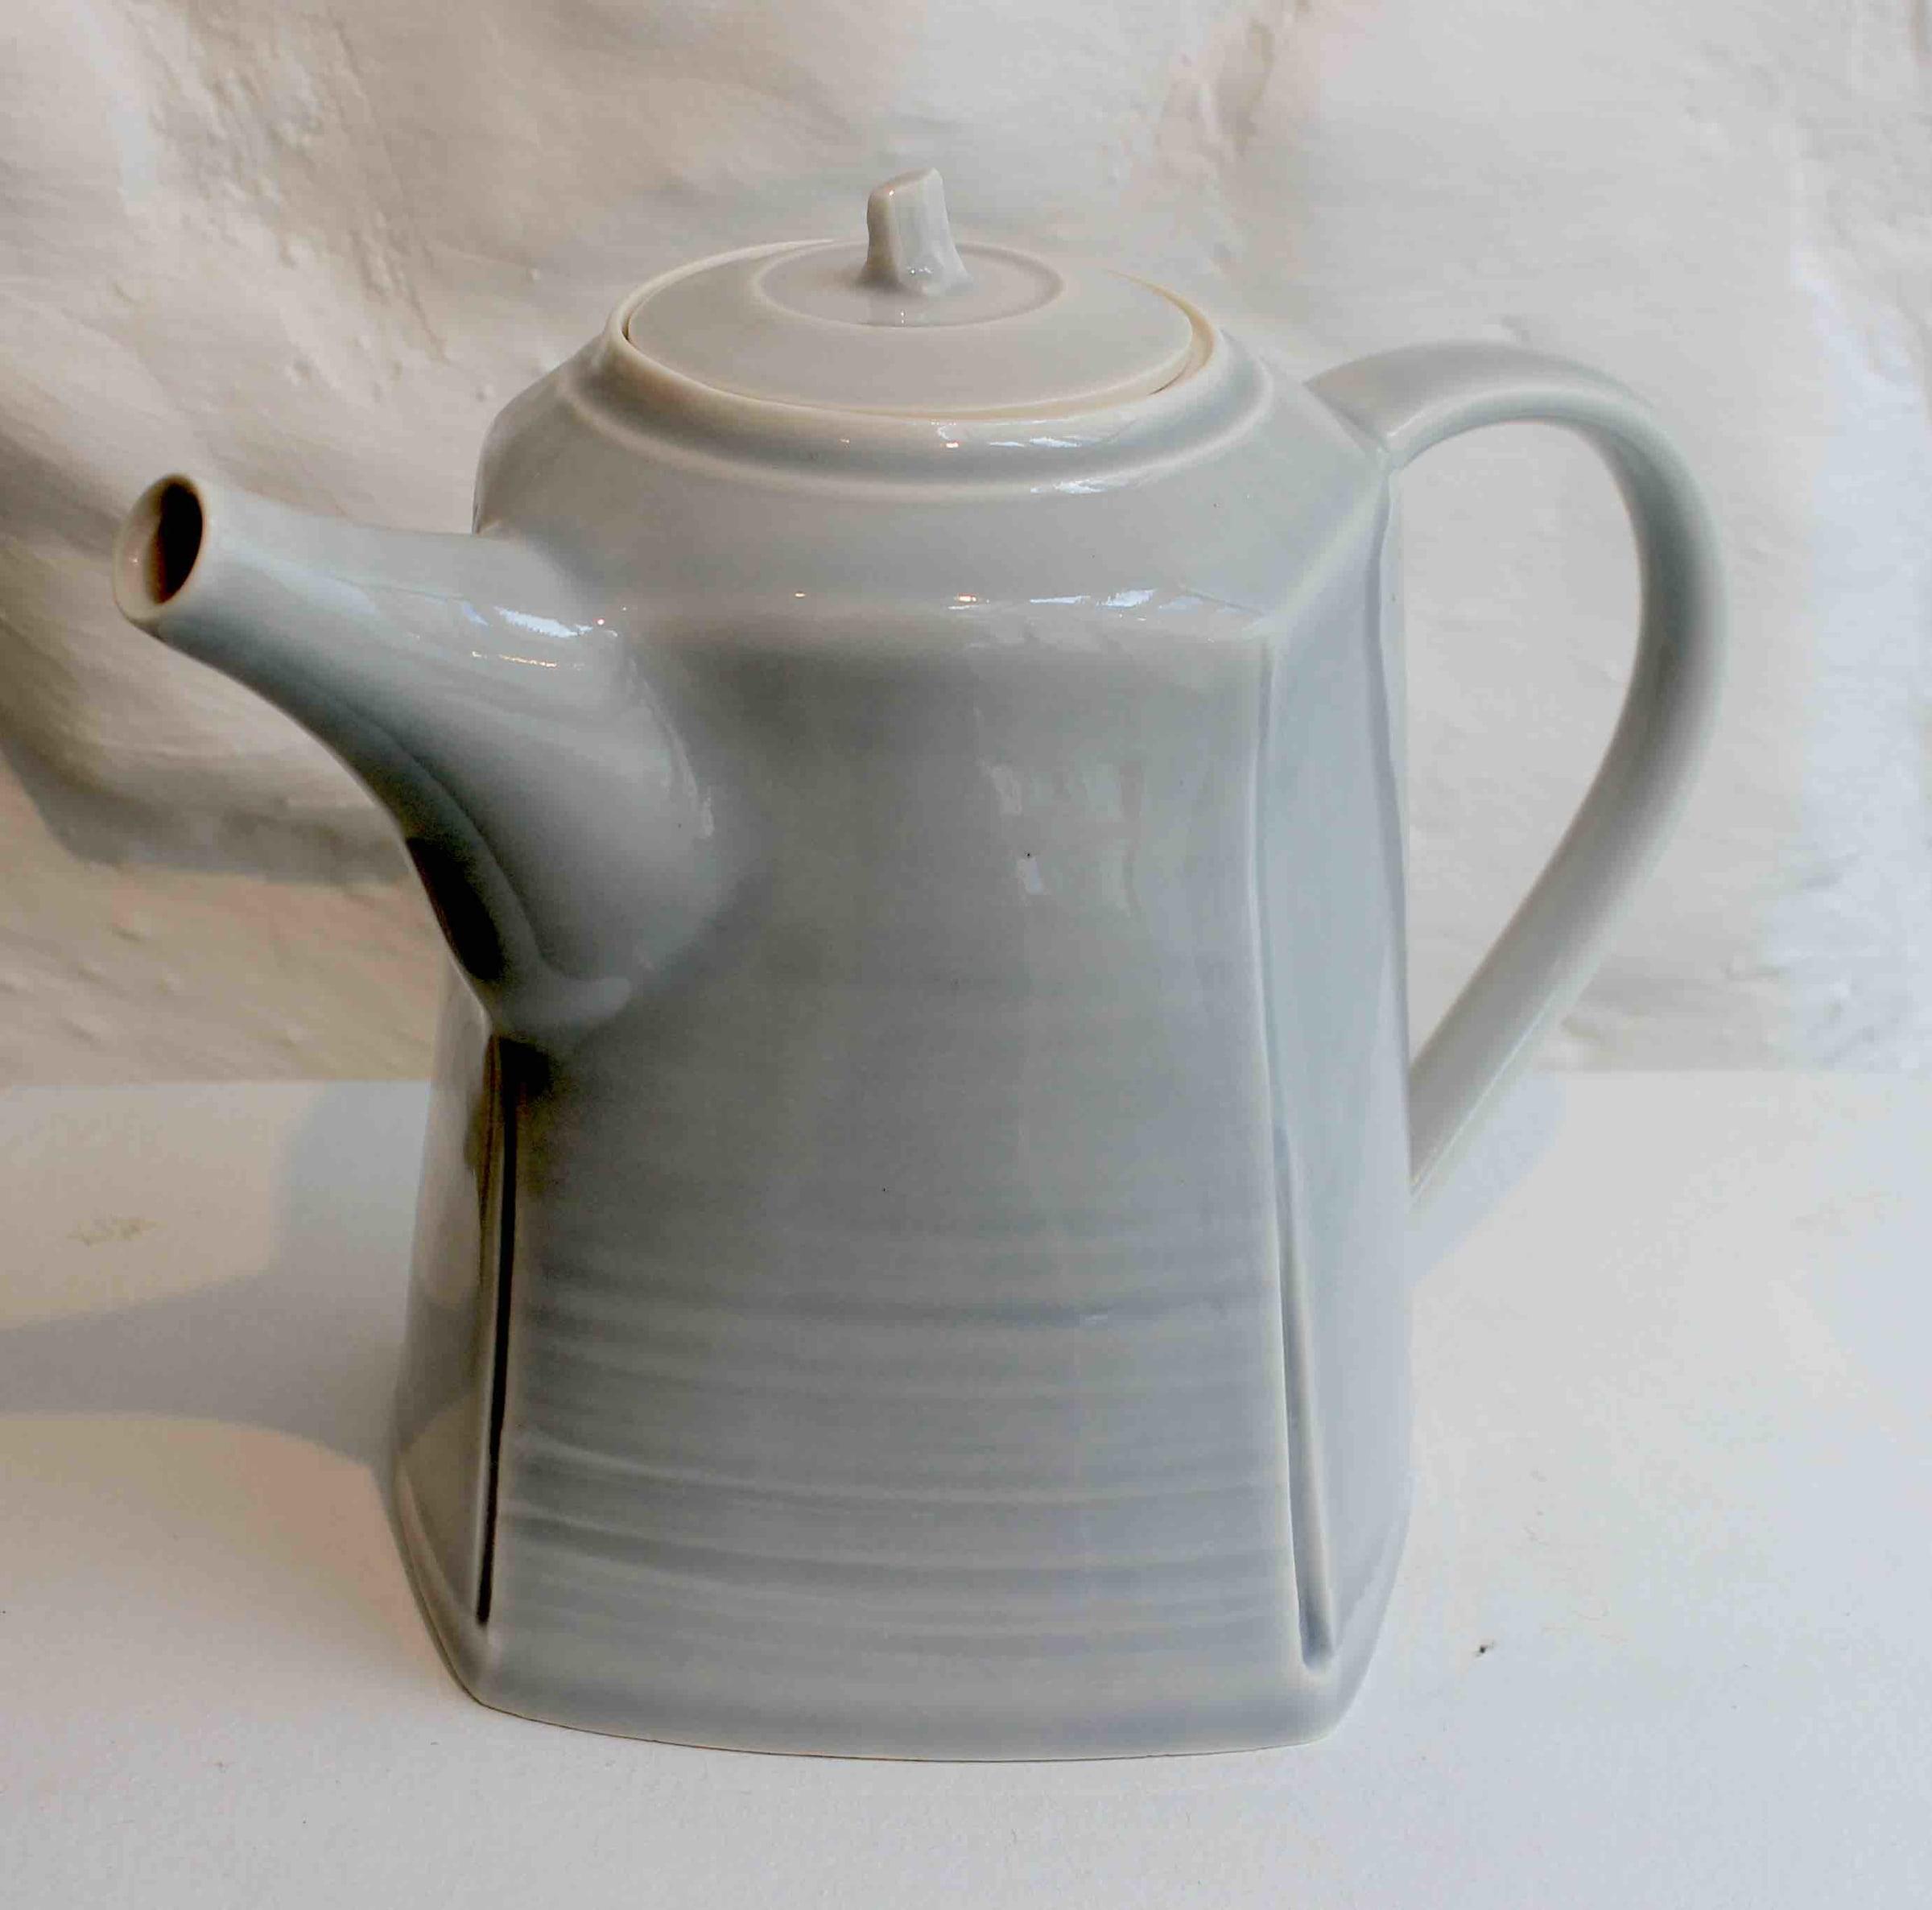 "<span class=""link fancybox-details-link""><a href=""/artists/99-carina-ciscato/works/5764-carina-ciscato-pale-grey-teapot-2018/"">View Detail Page</a></span><div class=""artist""><strong>Carina Ciscato</strong></div> b. 1970 <div class=""title""><em>Pale Grey Teapot</em>, 2018</div> <div class=""signed_and_dated"">porcelain</div> <div class=""medium"">porcelain</div> <div class=""dimensions"">6 x 14 cm<br /> 2 3/8 x 5 1/2 inches</div><div class=""price"">£600.00</div><div class=""copyright_line"">OwnArt: £60 x 10 Months, 0% APR</div>"